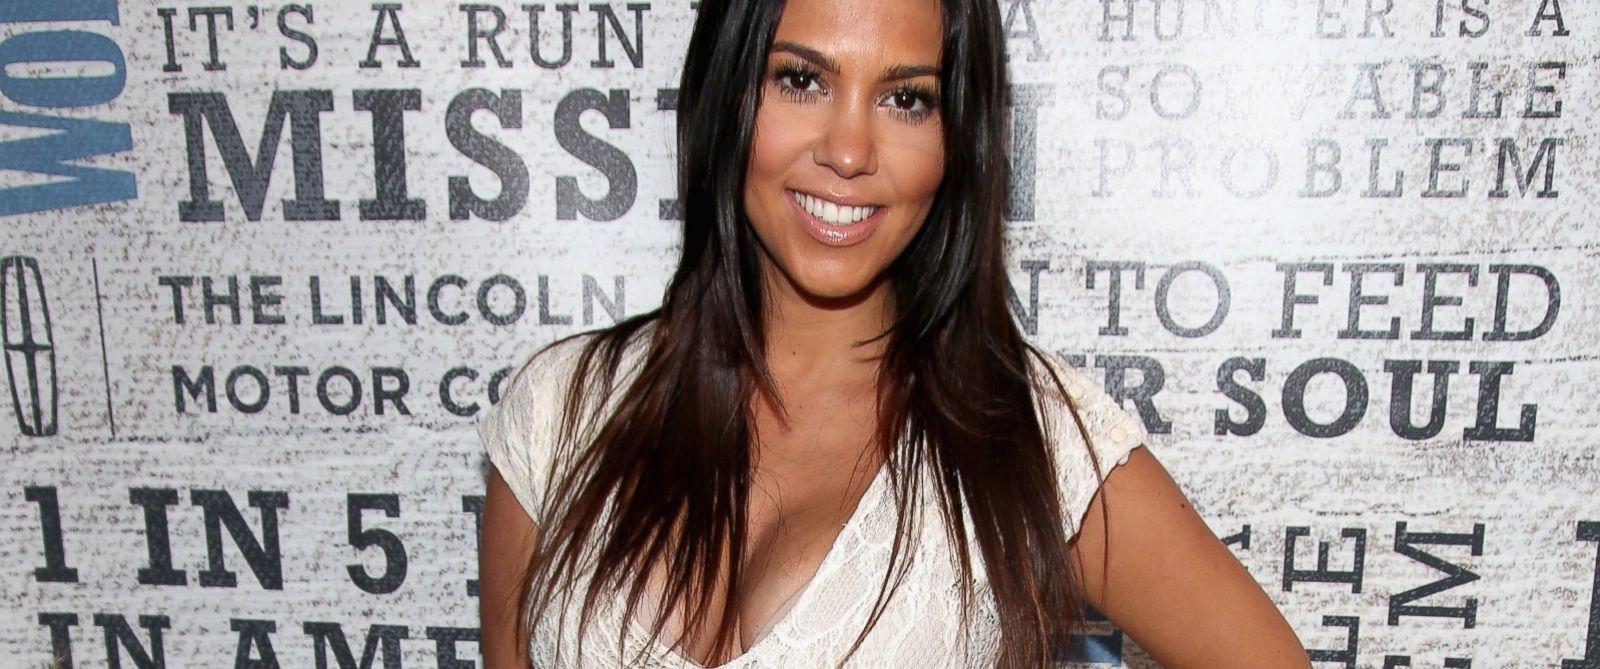 "PHOTO: TV Personality Kourtney Kardashian attends Womens Health Hosts Hamptons ""Party Under The Stars"" for RUN10 FEED10 at Bridgehampton Tennis and Surf Club, Aug. 9, 2014, in Bridgehampton, N.Y."